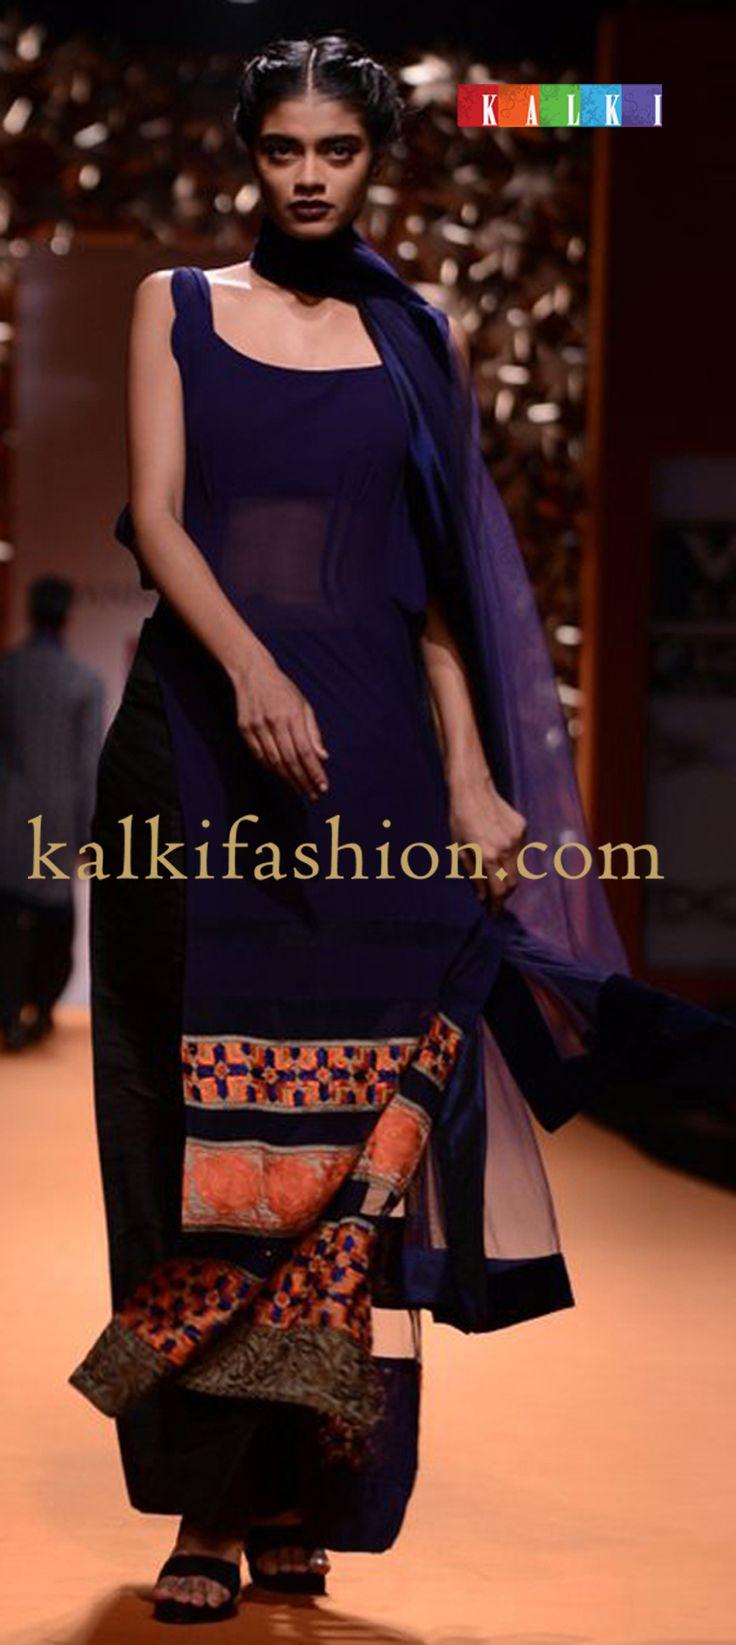 http://www.kalkifashion.com/designers/manish-malhotra.html  navy-blue-suit-with-geometric-border